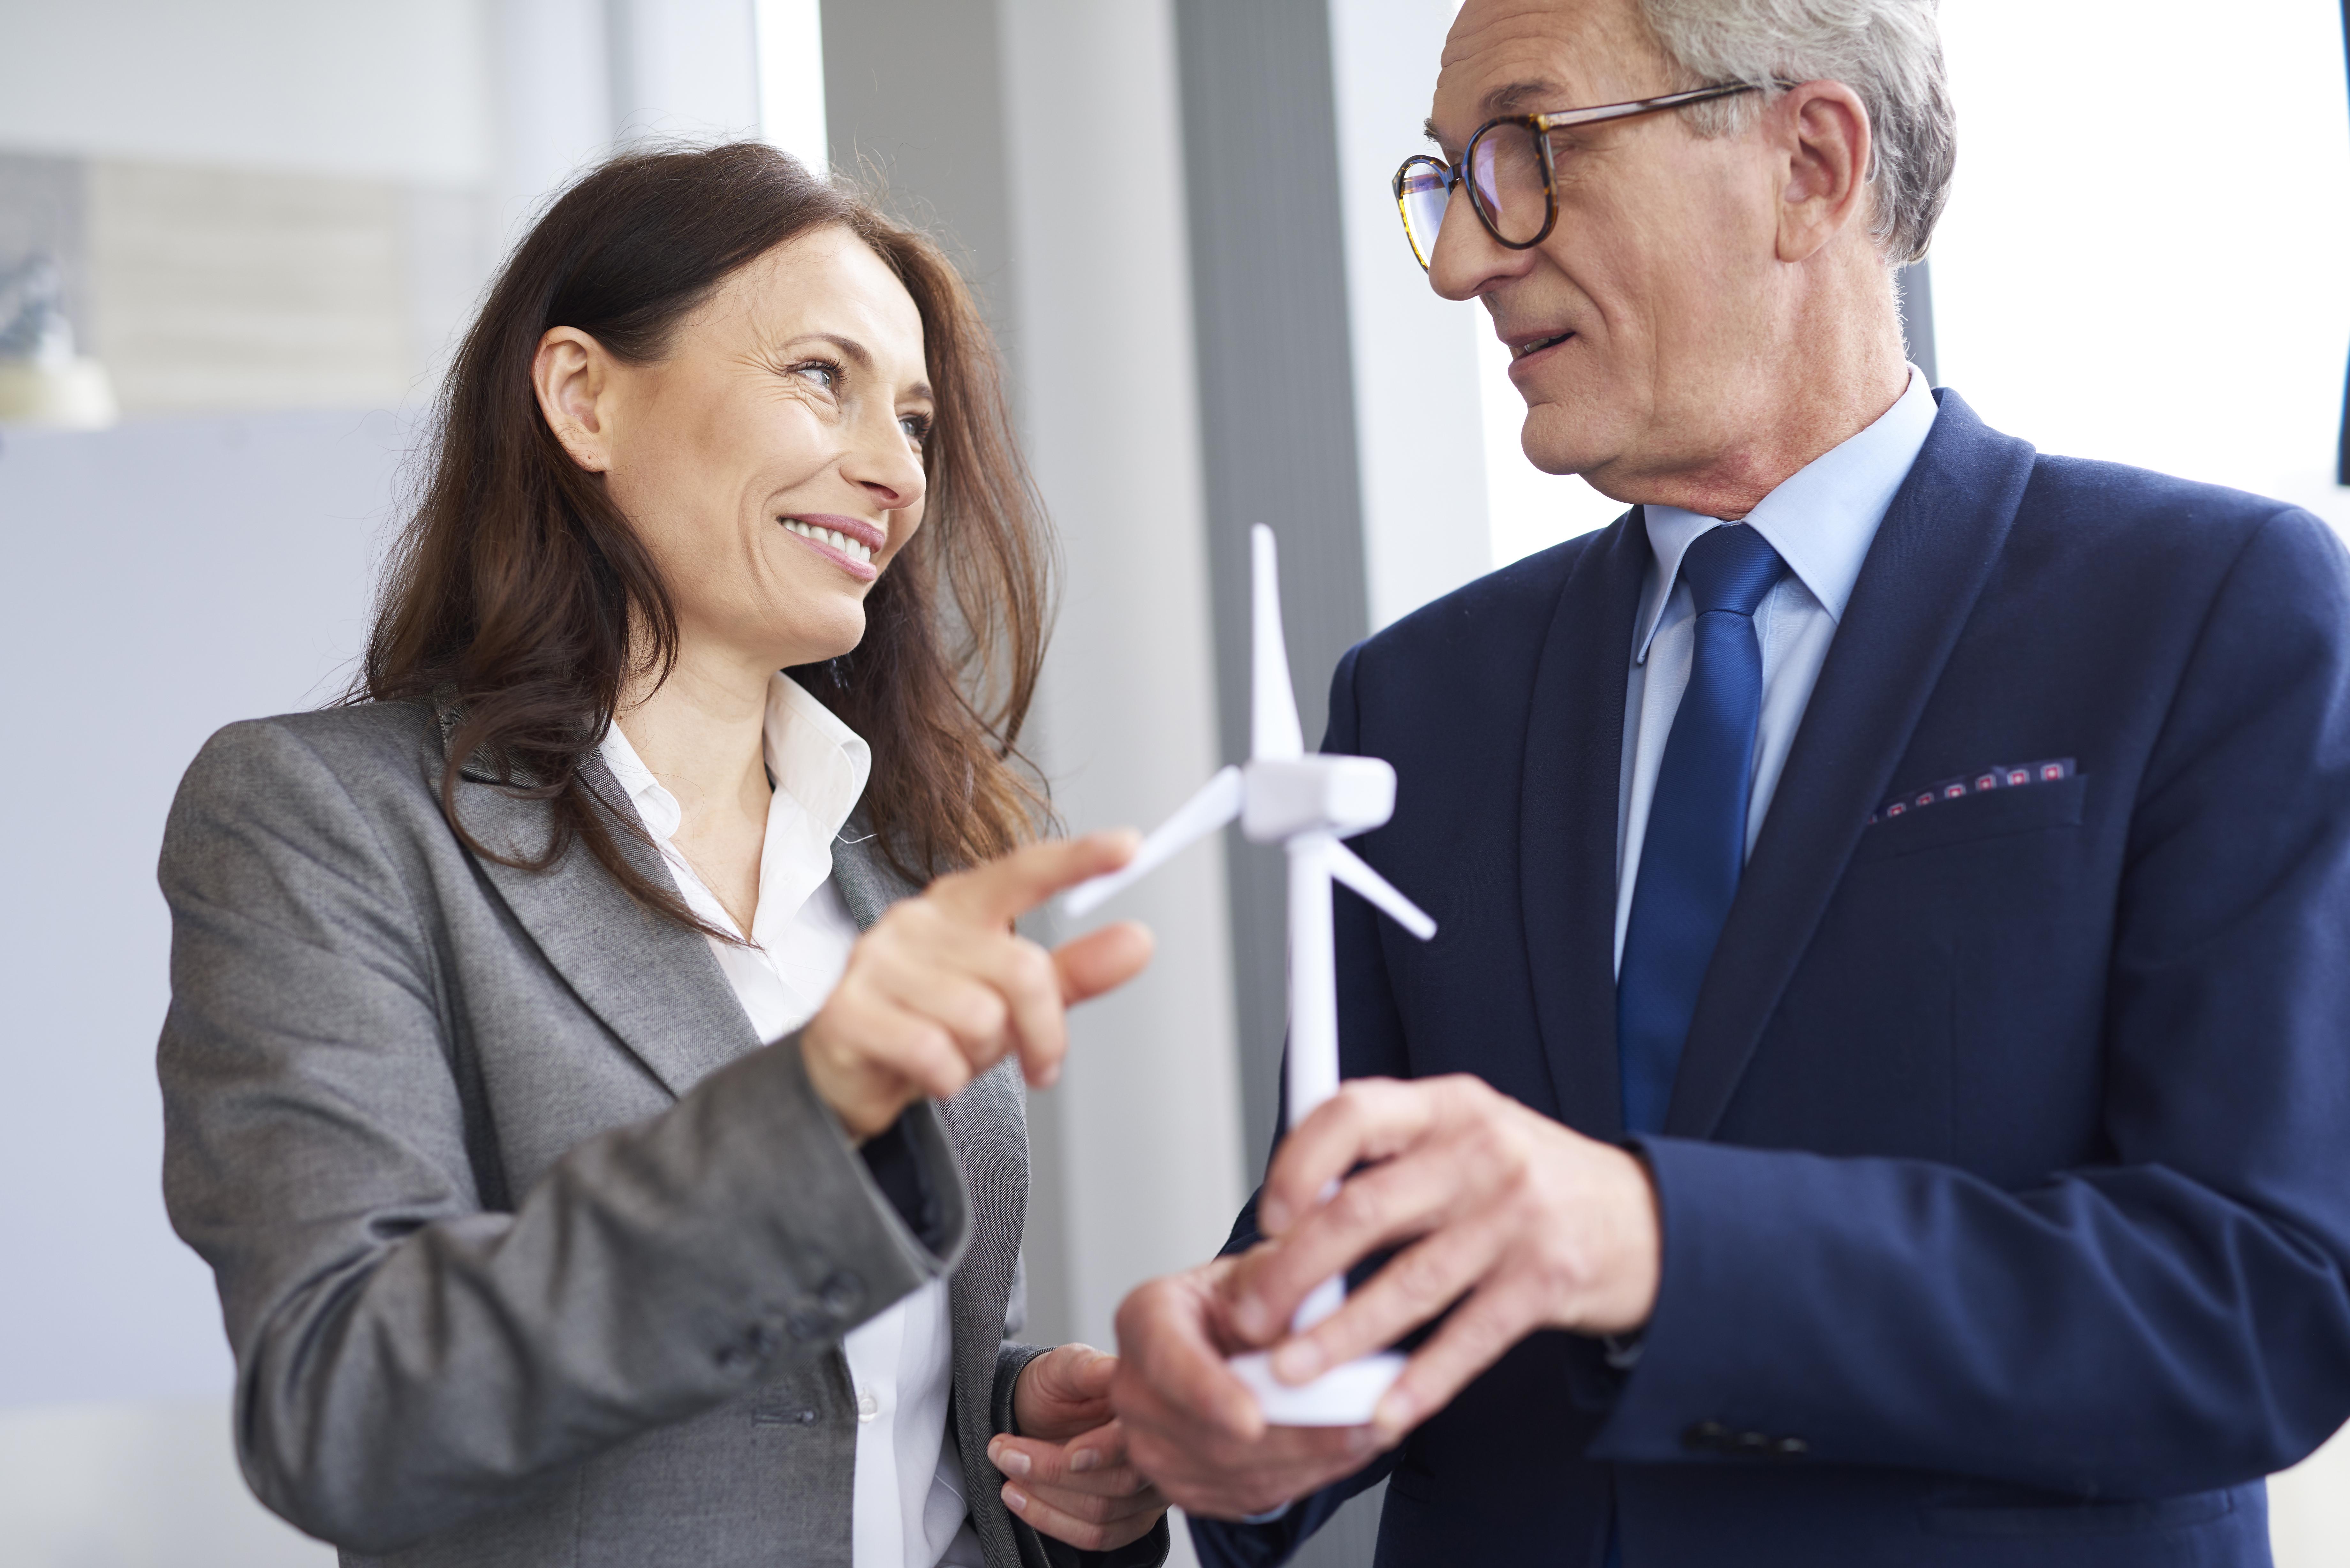 https://watt.co.uk/wp-content/uploads/2020/04/business-workers-having-a-conversation-about-wind-ZHAQ8RW.jpg